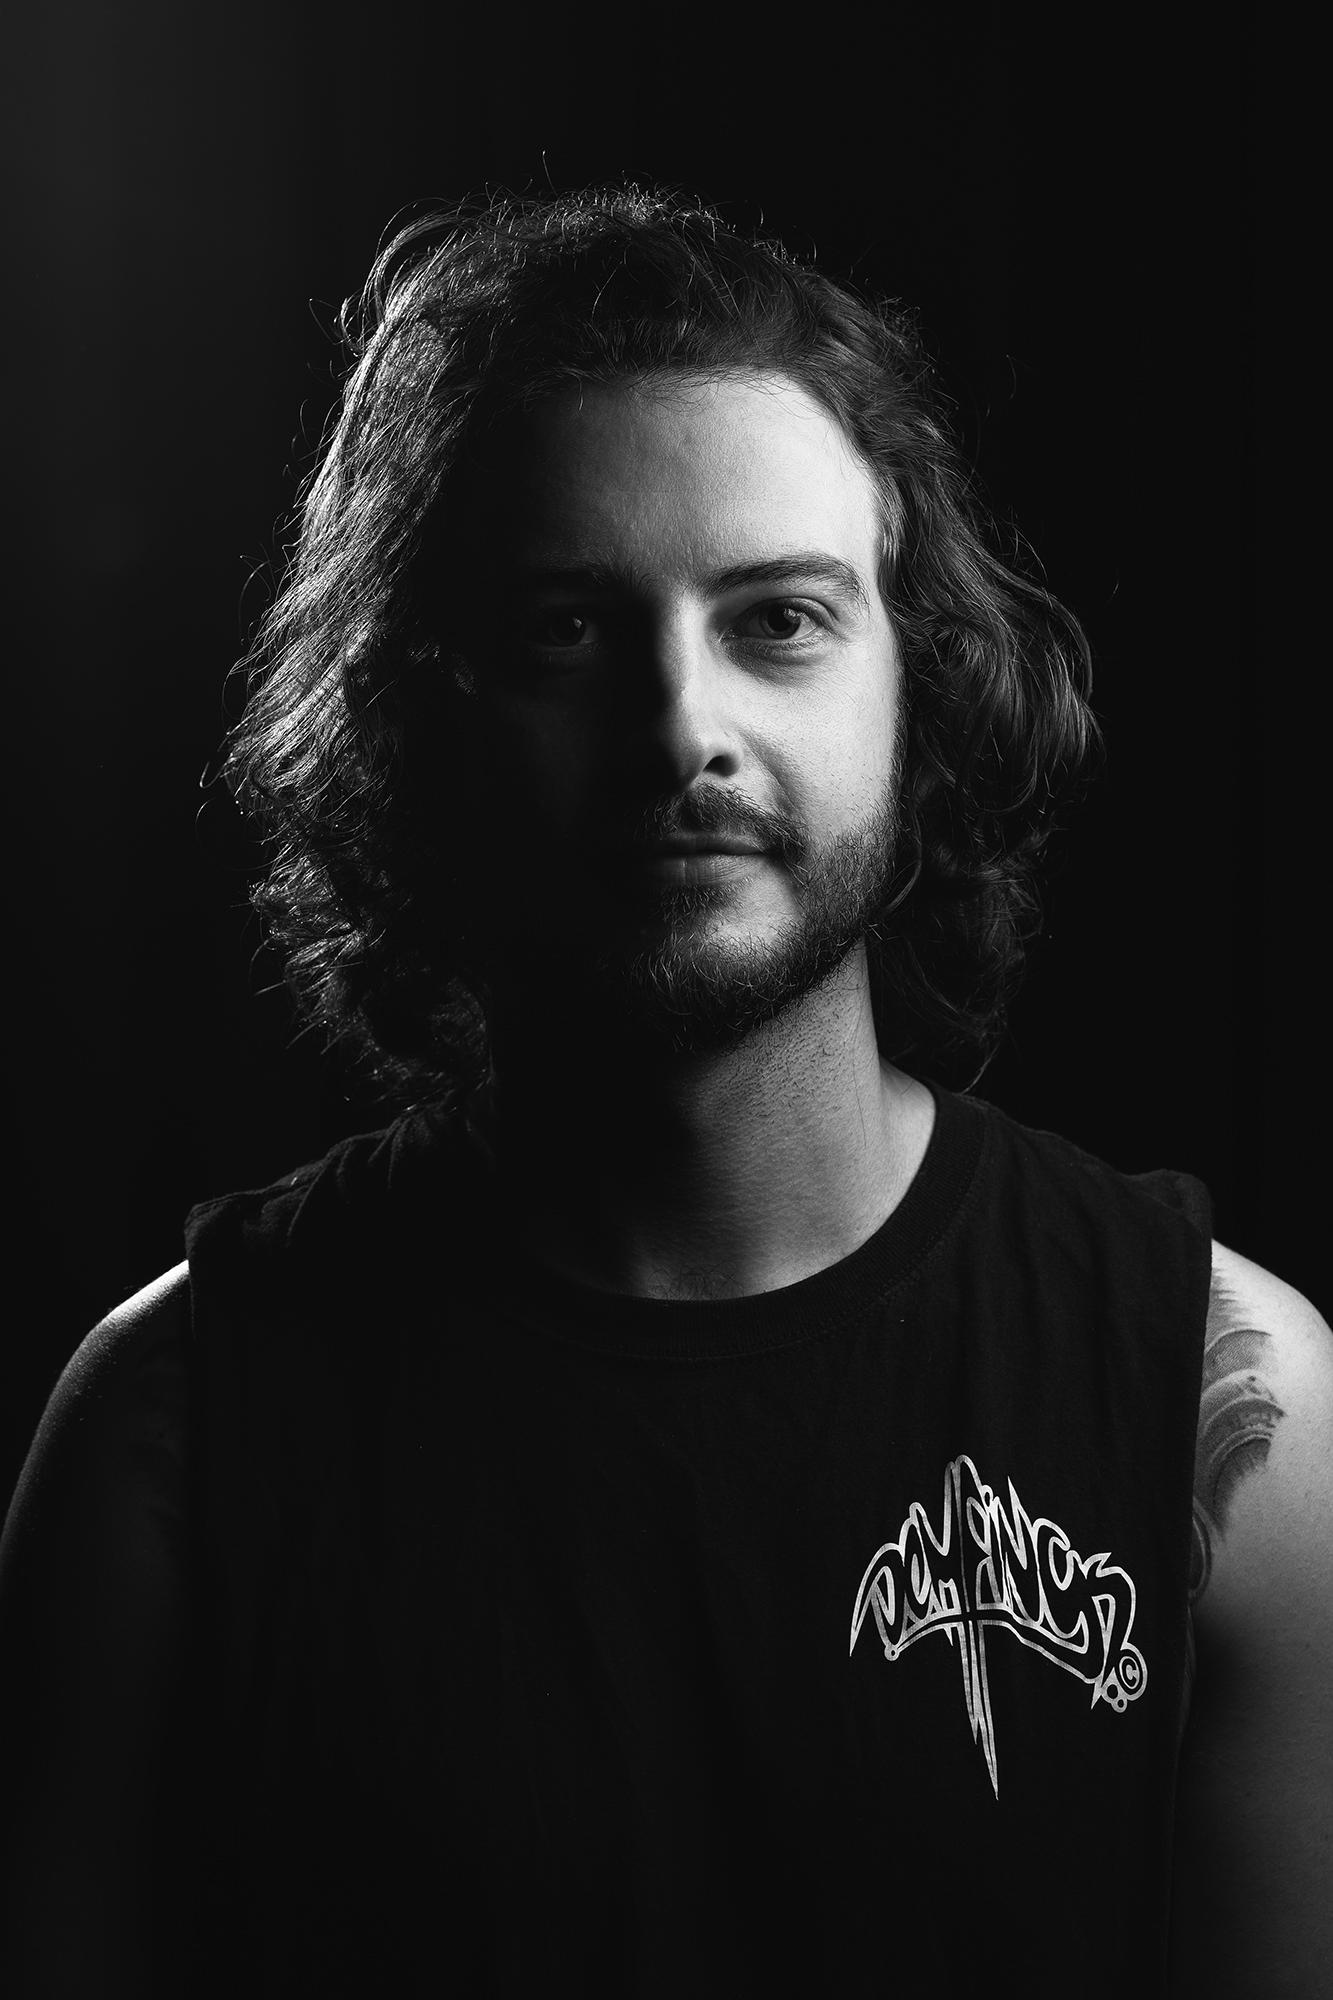 Karl steller - DrumsGravemind & Boris the bladeFormer VocalsHollow World